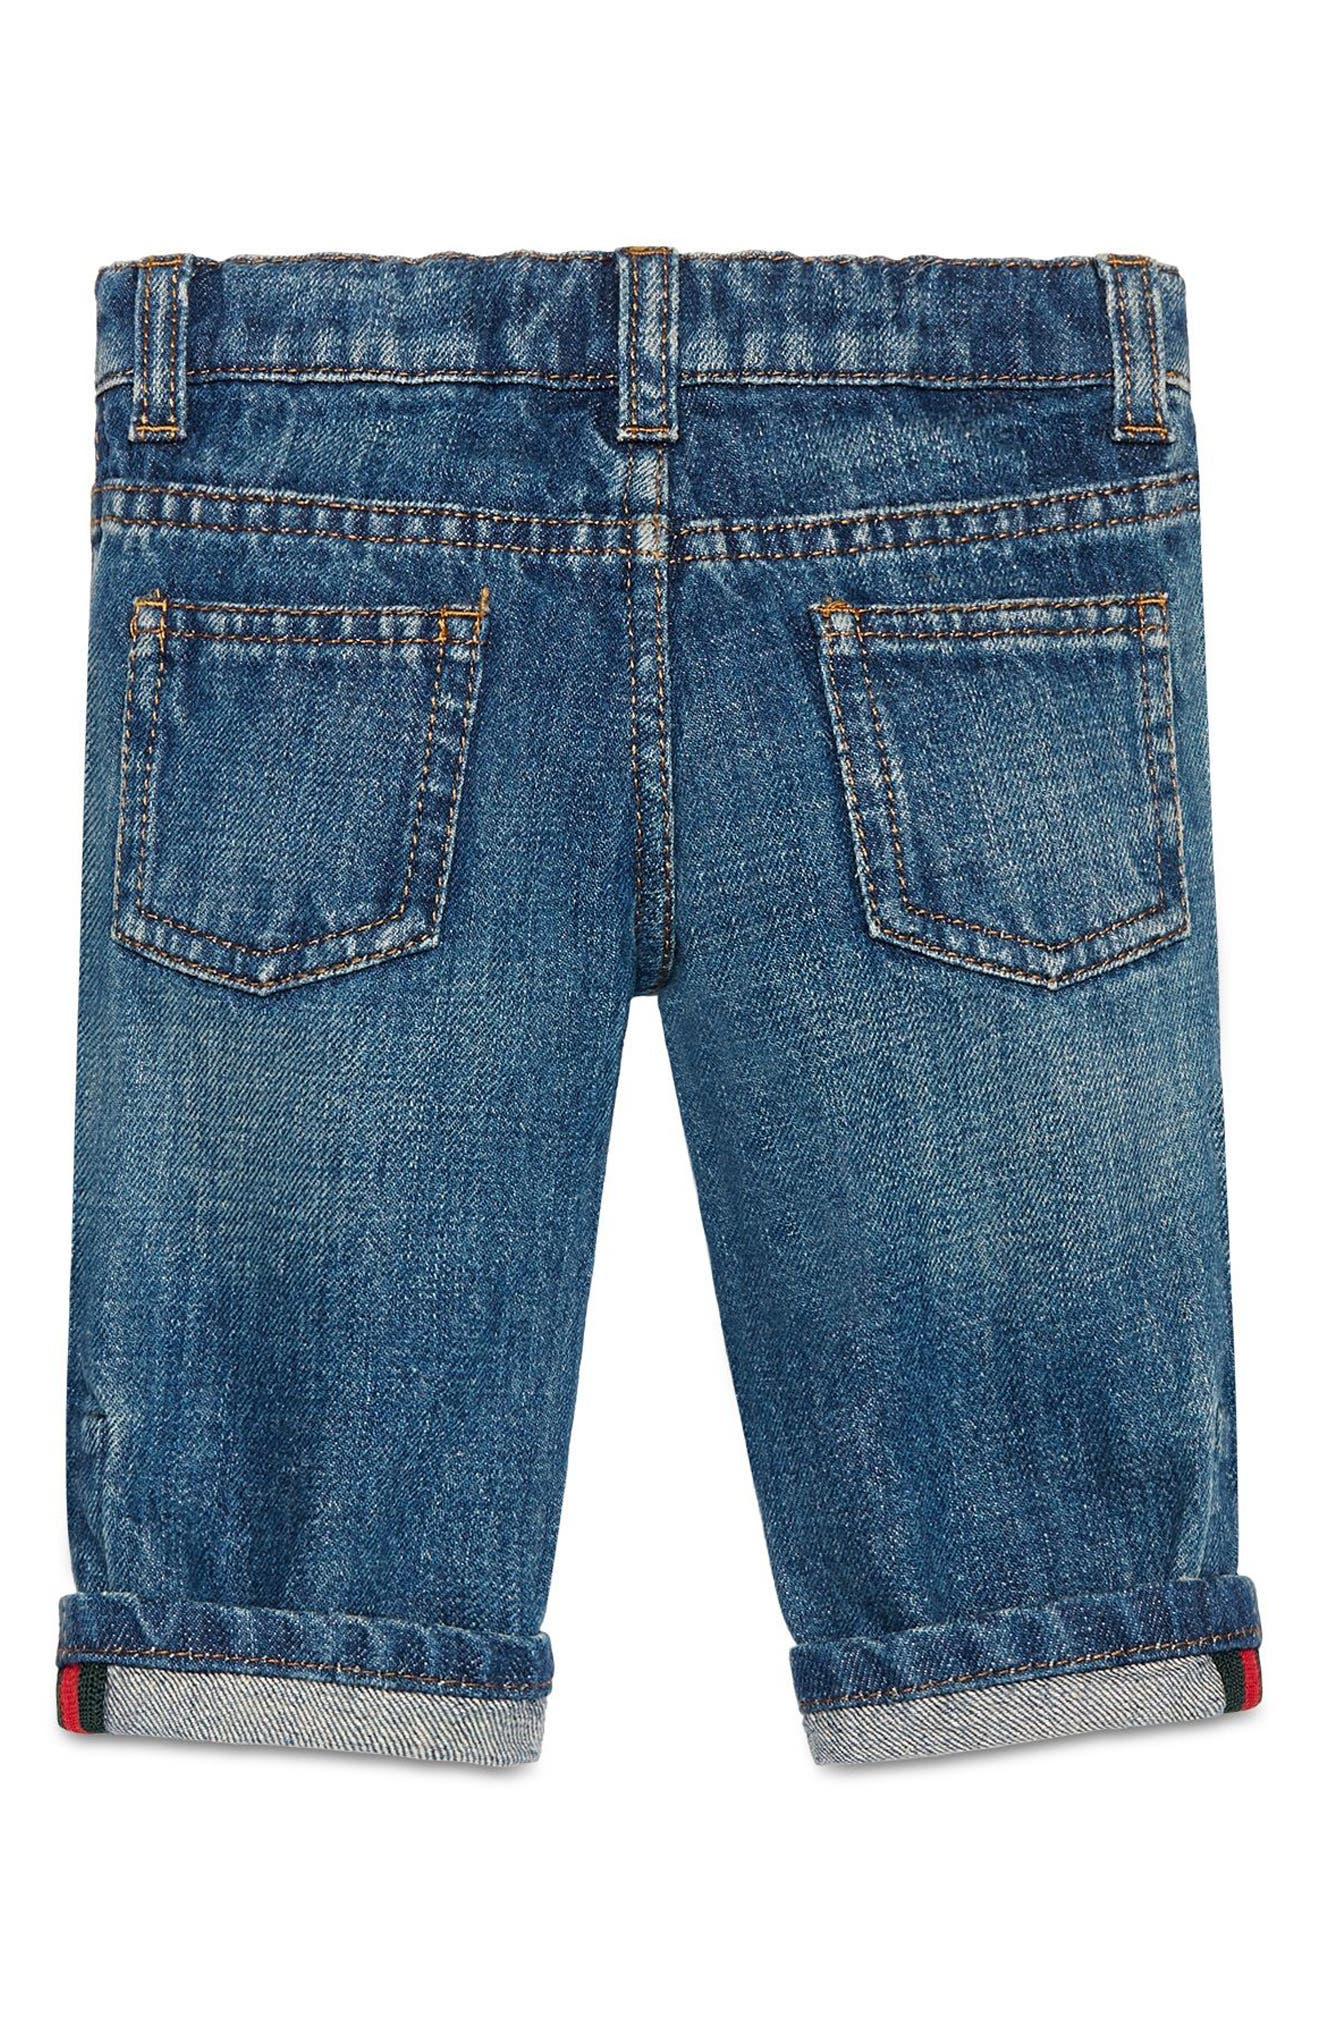 Alternate Image 2  - Gucci Straight Leg Jeans (Baby Boys & Toddler Boys)